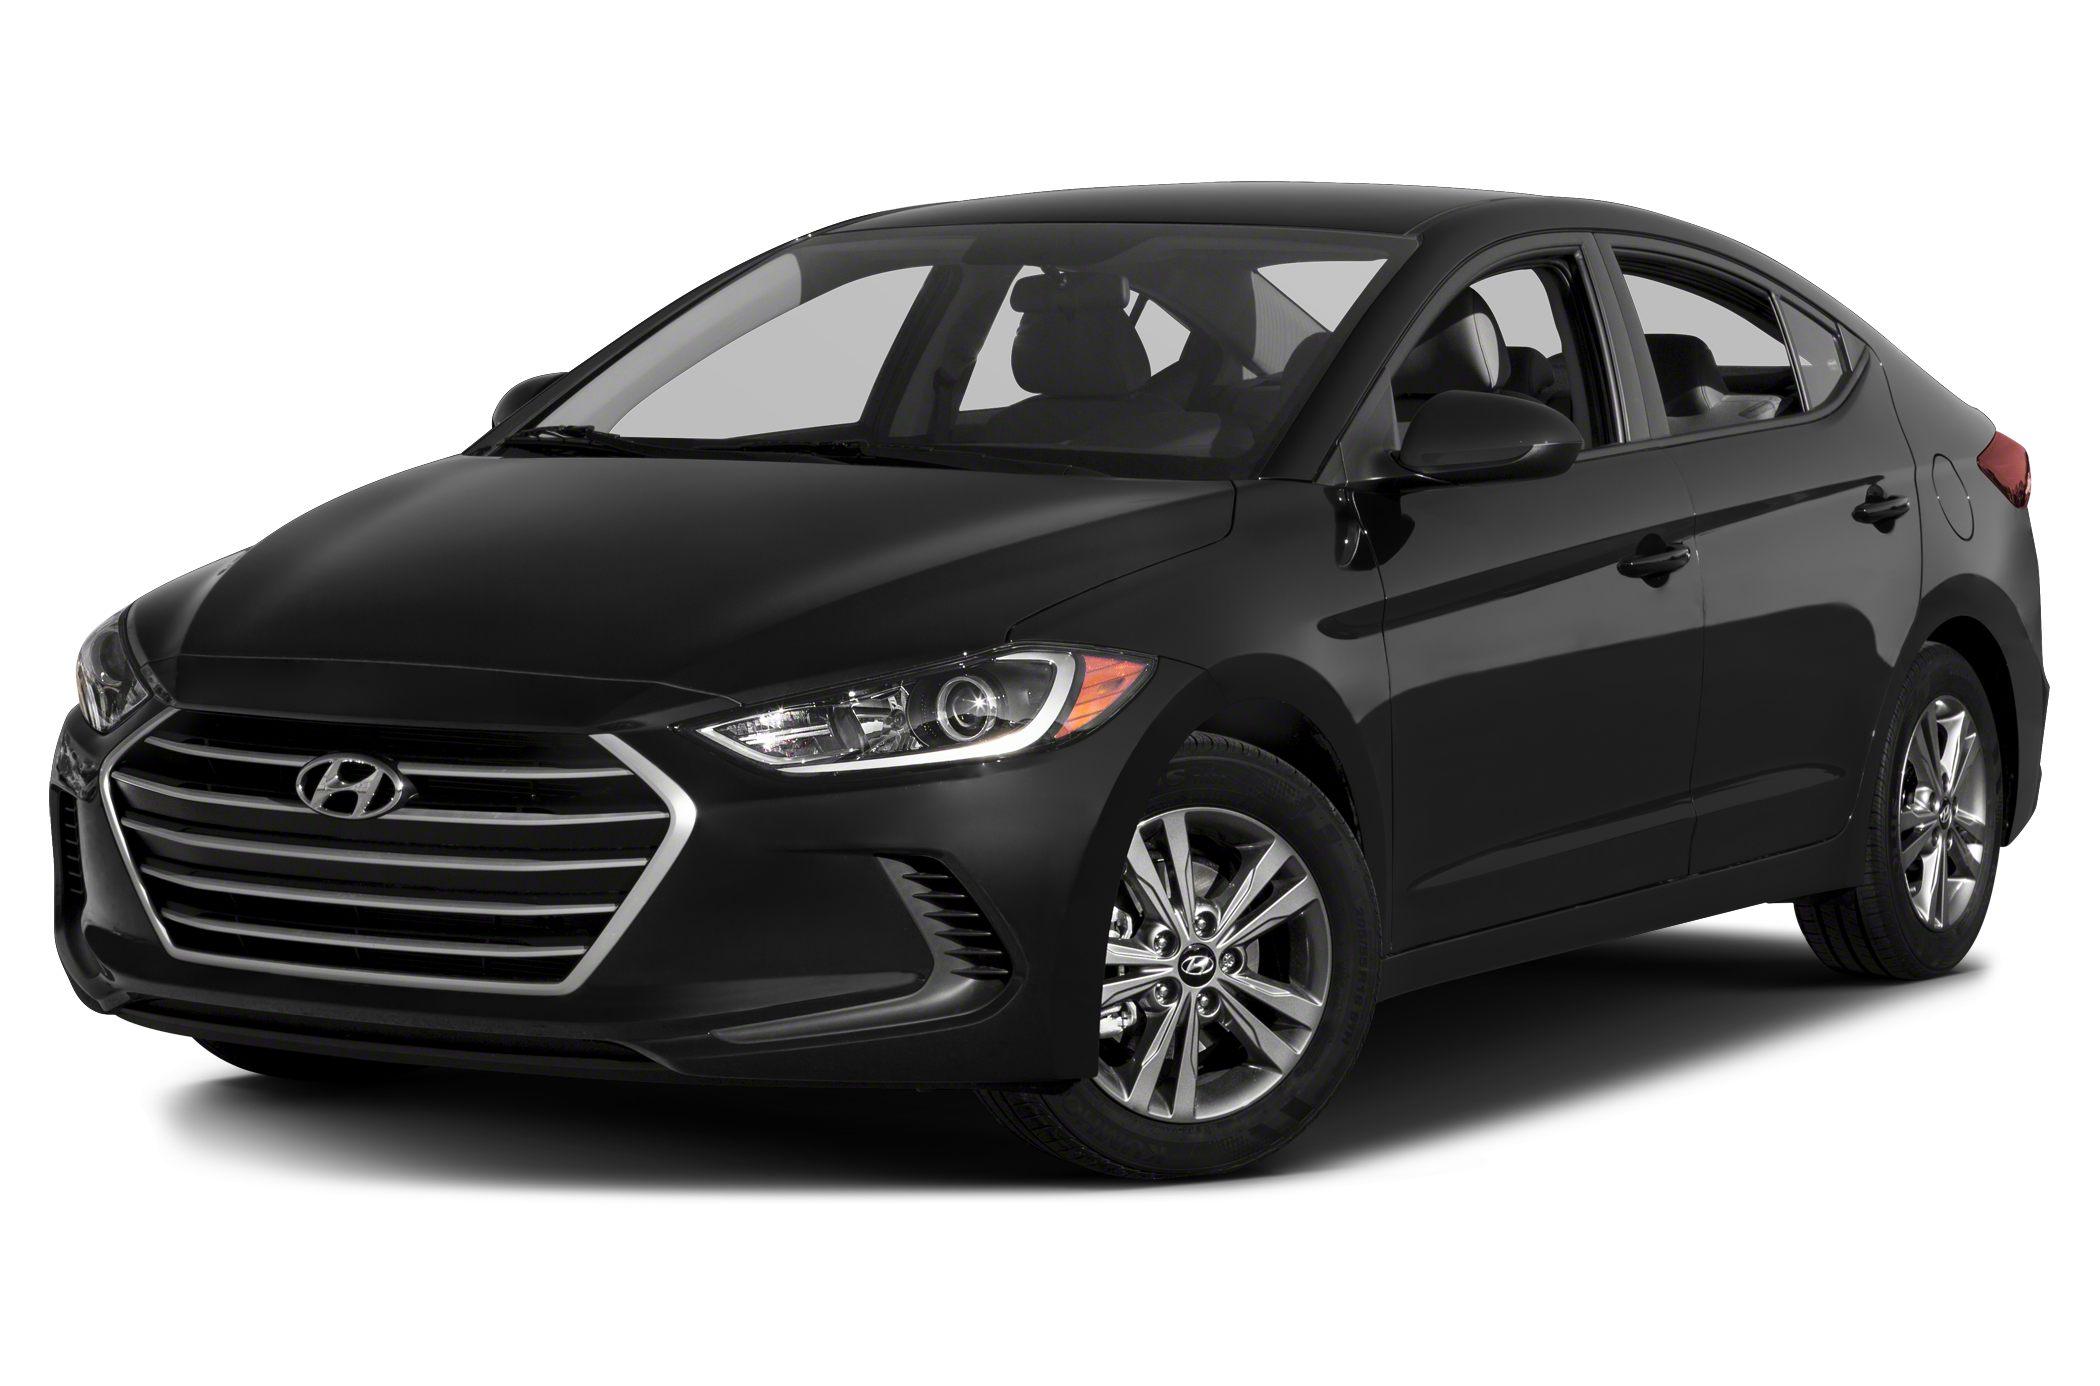 2016 Hyundai Elantra Value Edition >> Nine things we learned driving the 2017 Hyundai Elantra [w ...